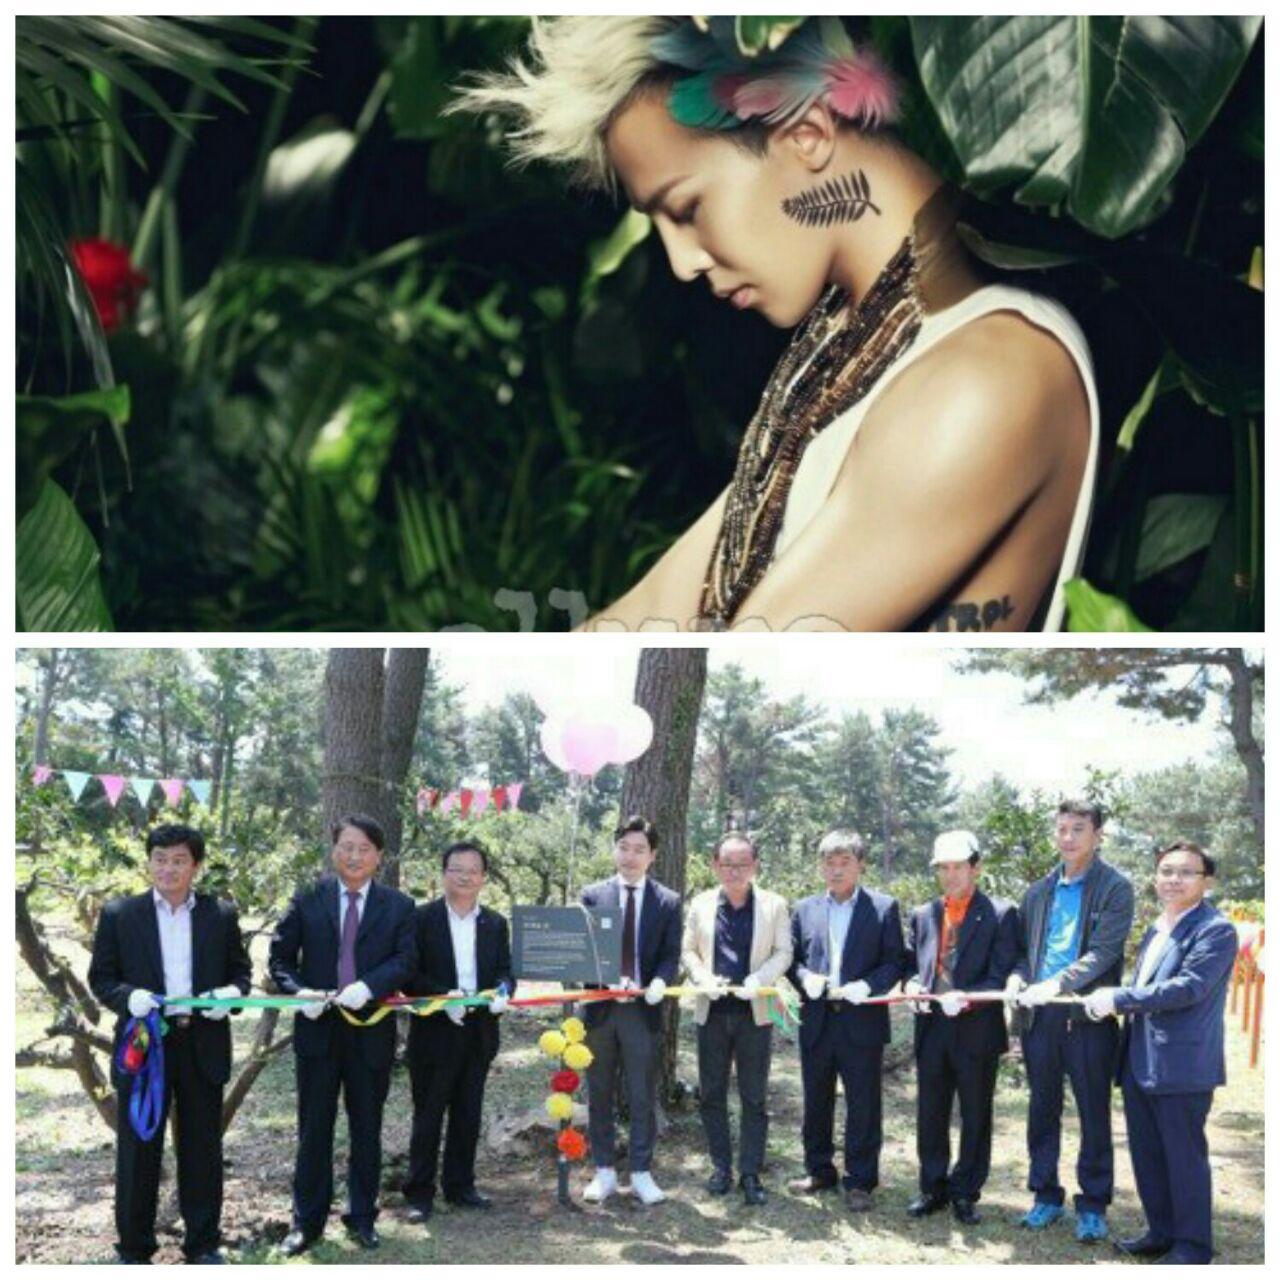 افتتاح جنگلی به اسم جی دراگون